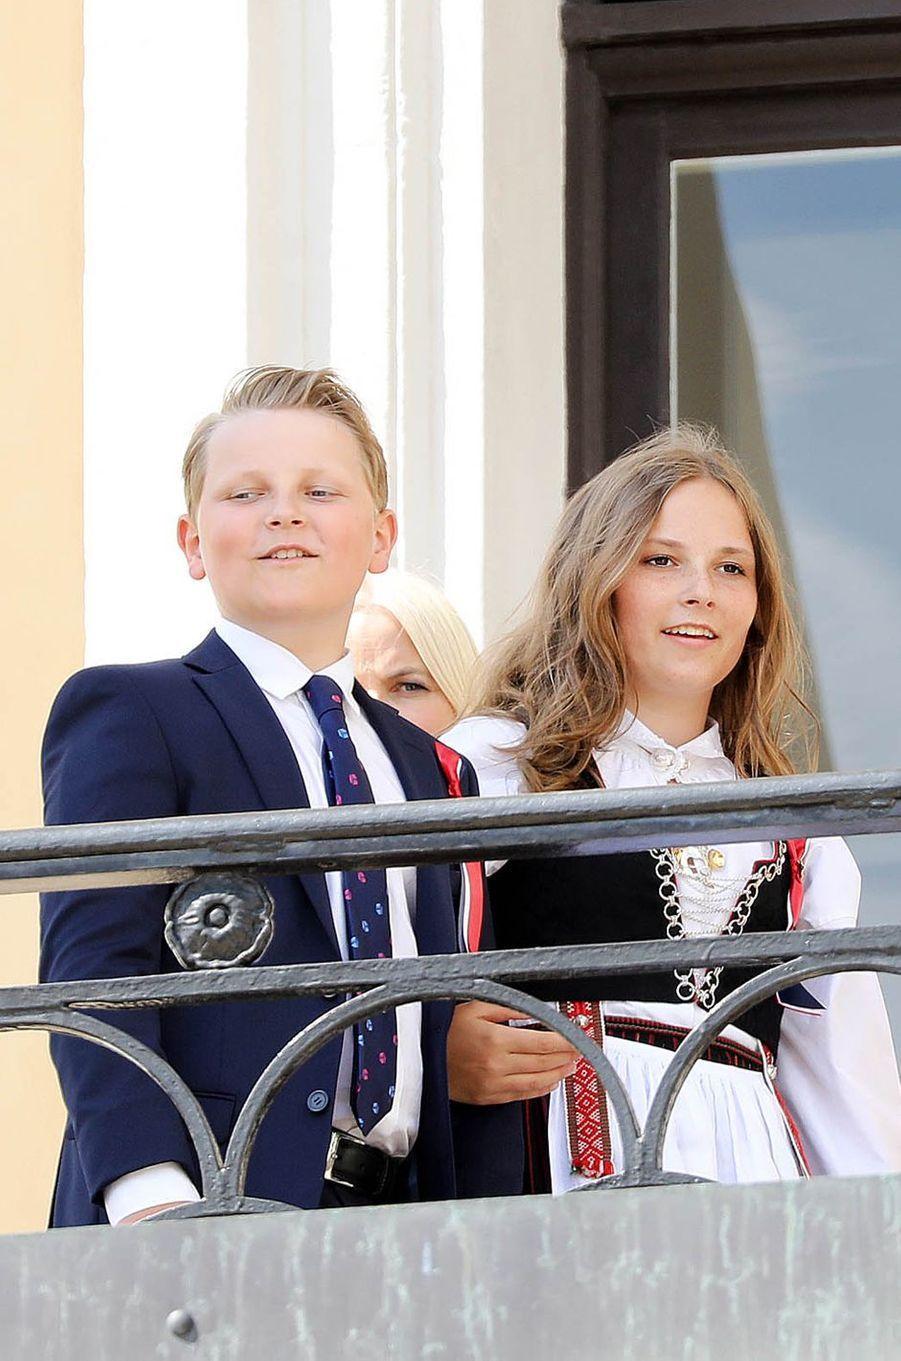 Le prince Sverre Magnus et la princesse Ingrid Alexandra de Norvège à Oslo, le 17 mai 2018